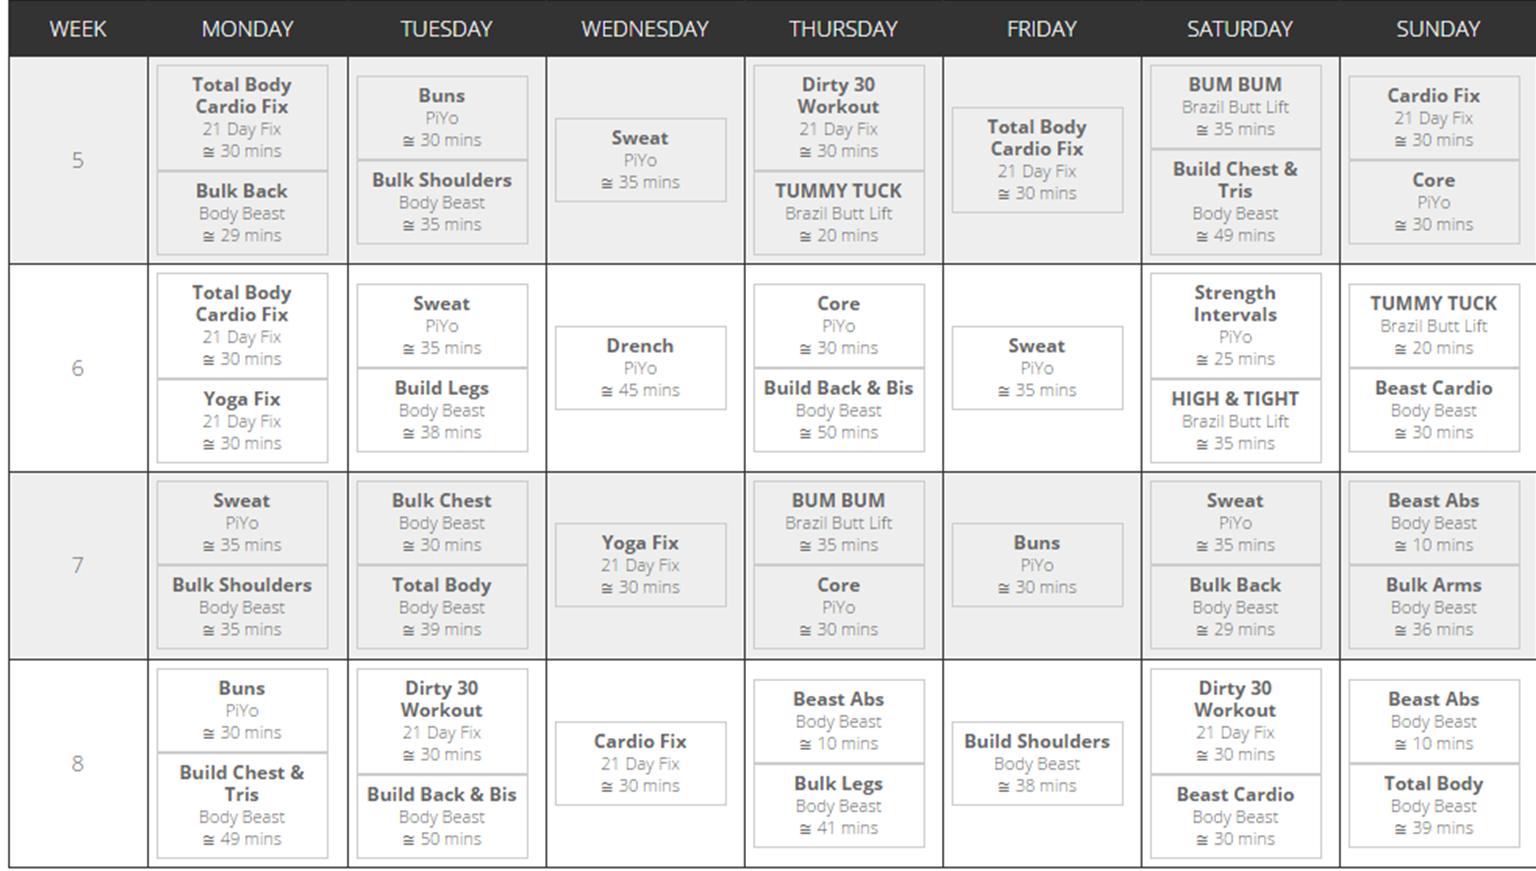 21 Day Fix Beachbody Calendar 2015  Festival Calendar with Piyo 21 Day Fix Hybrid